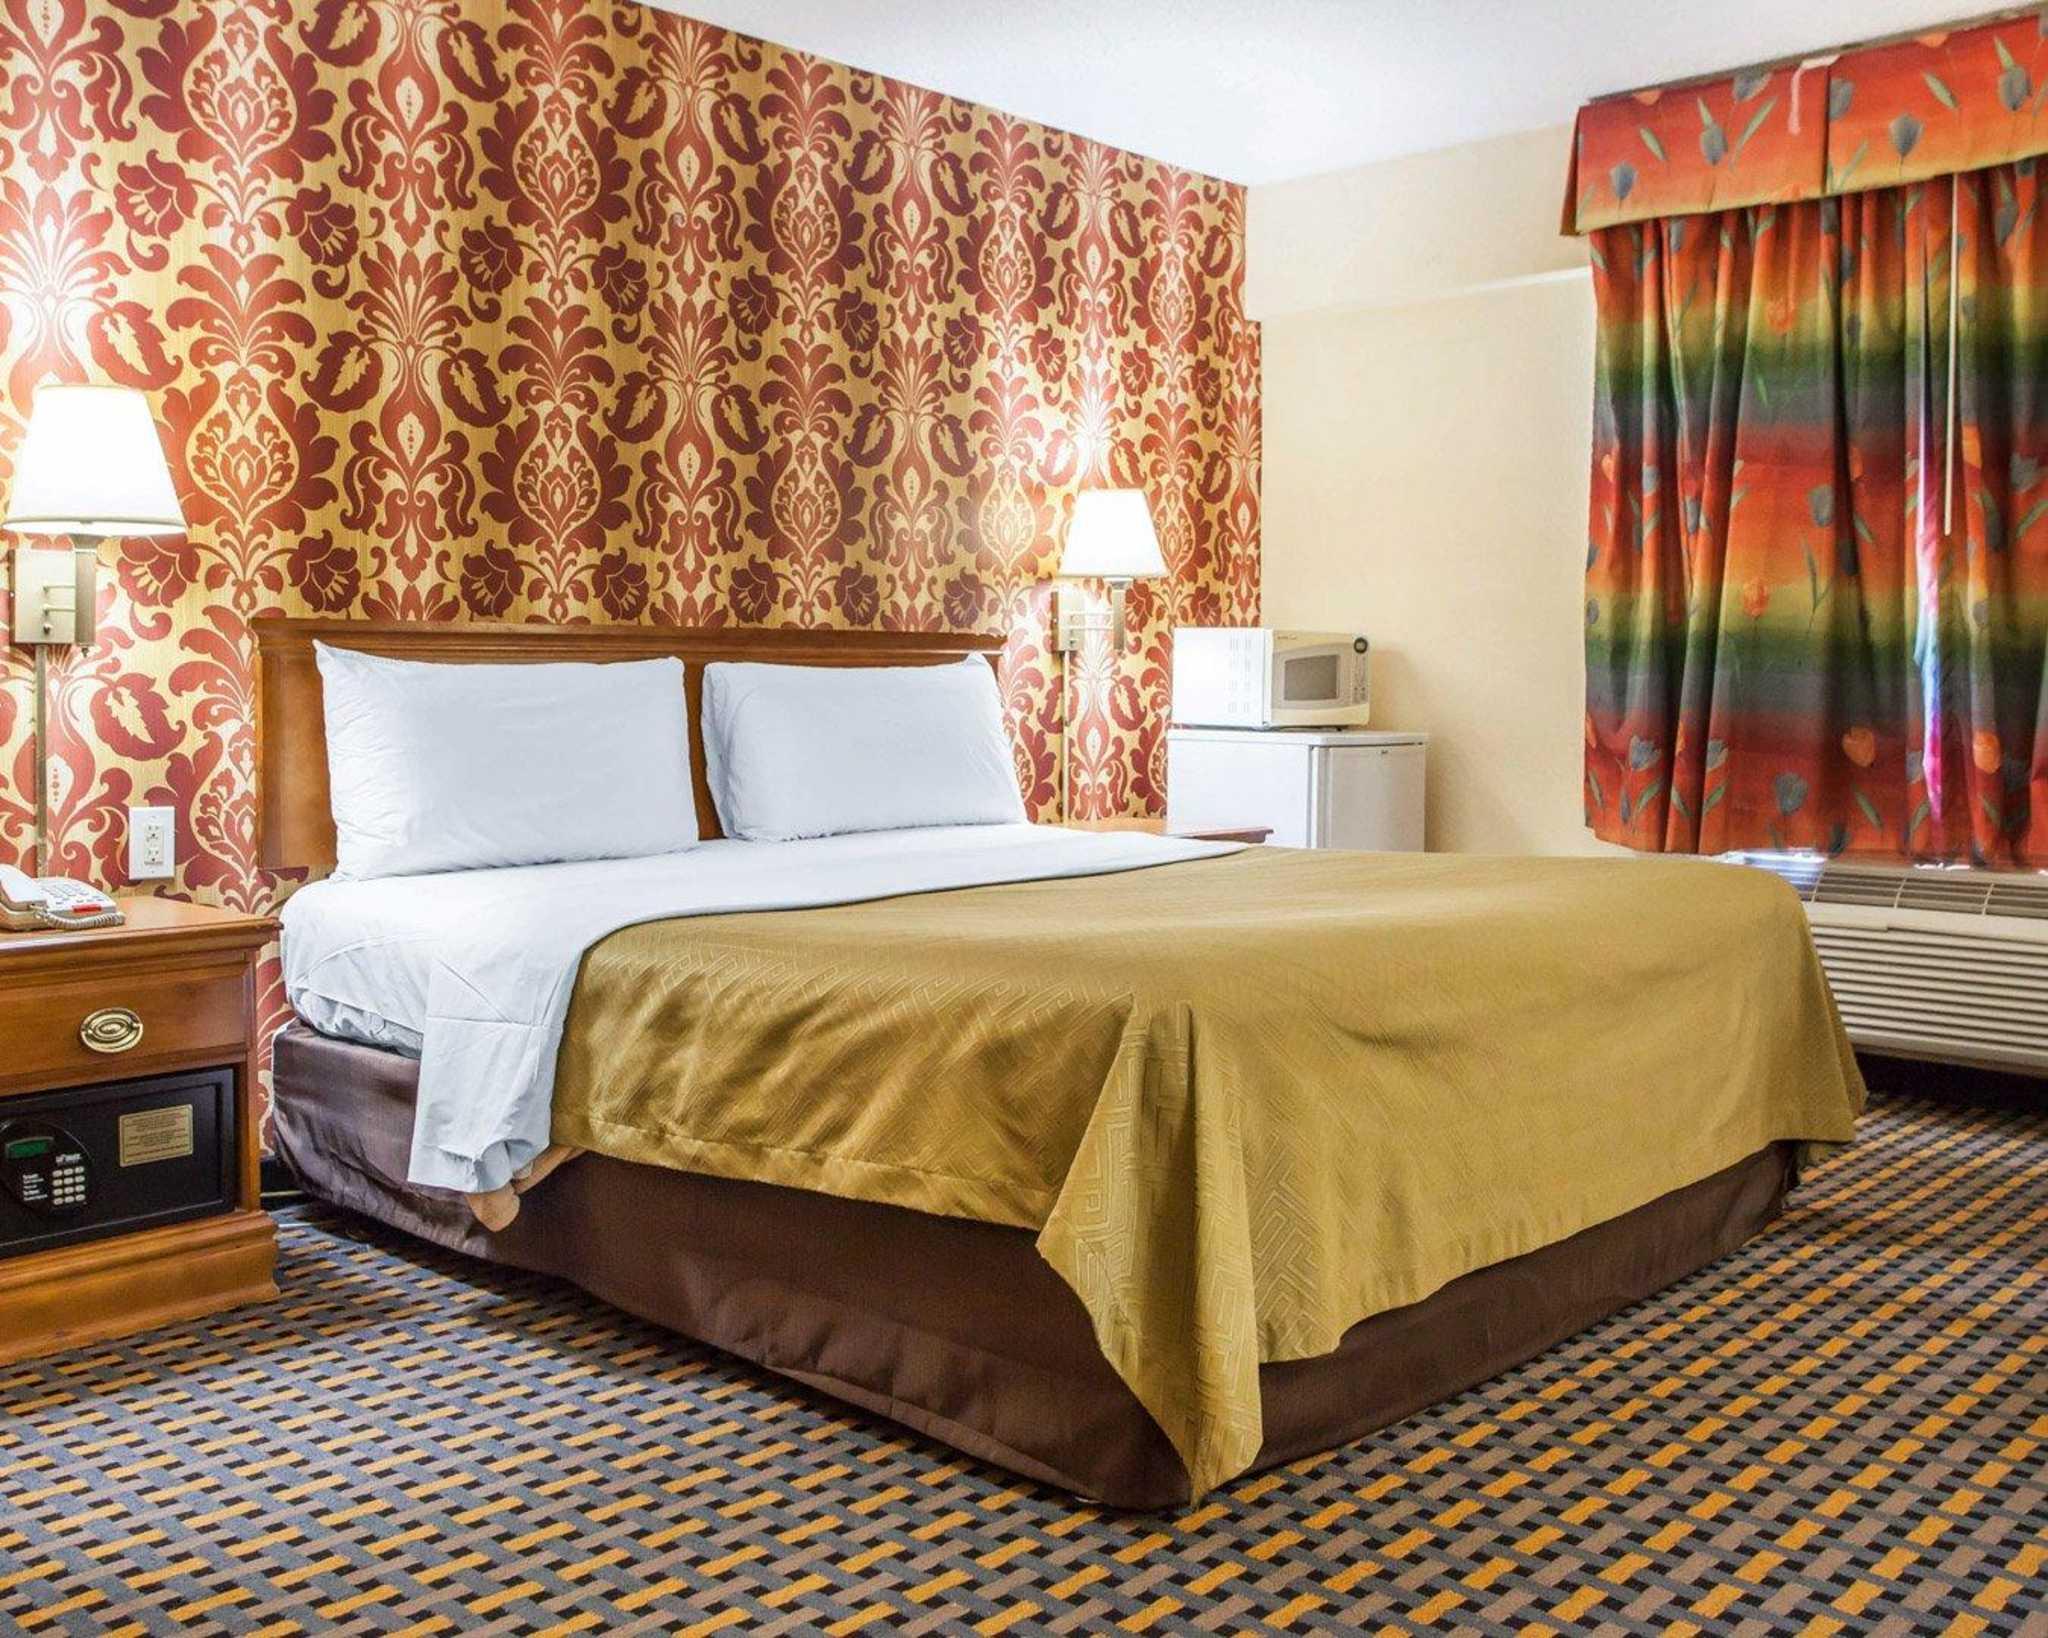 Econo Lodge image 17